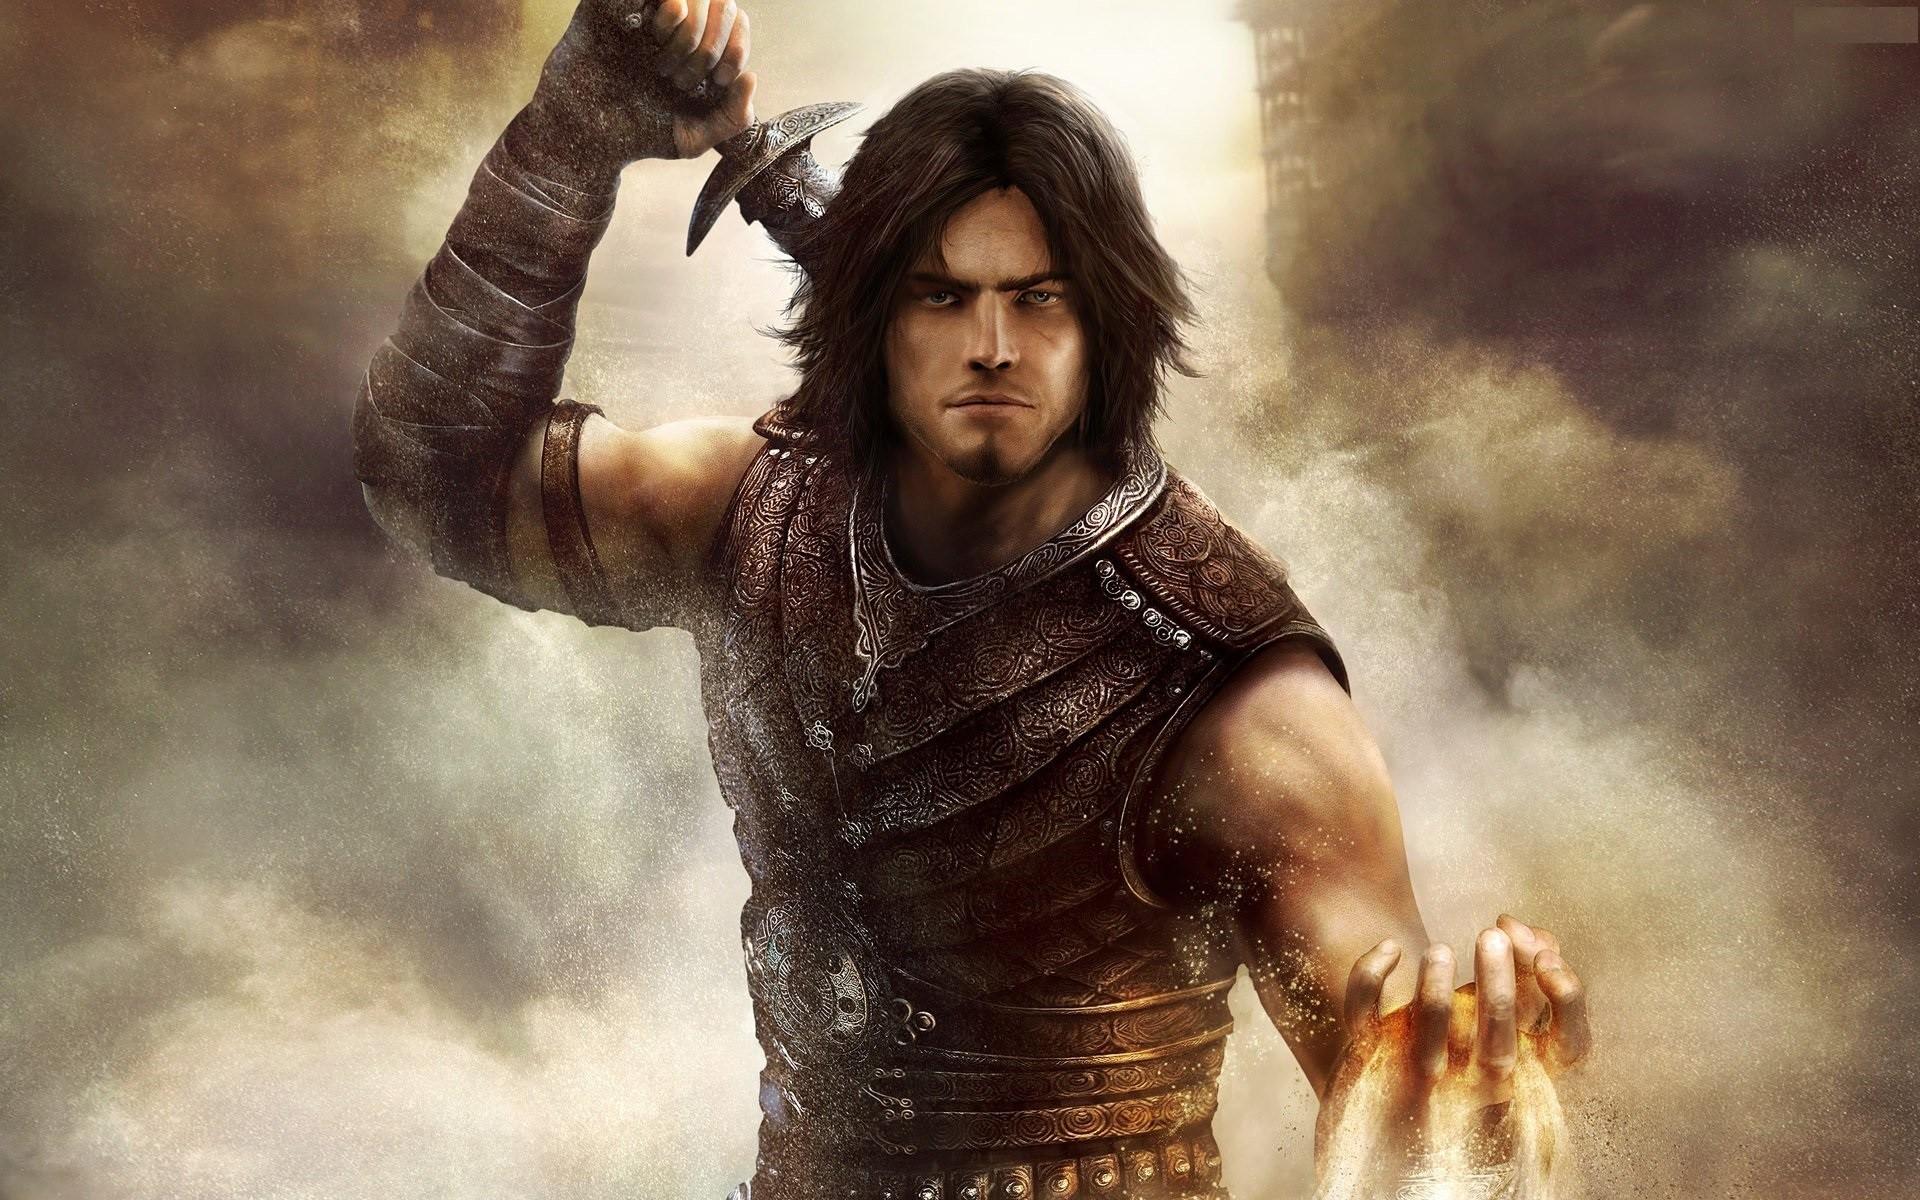 Prince-of-Persia-6